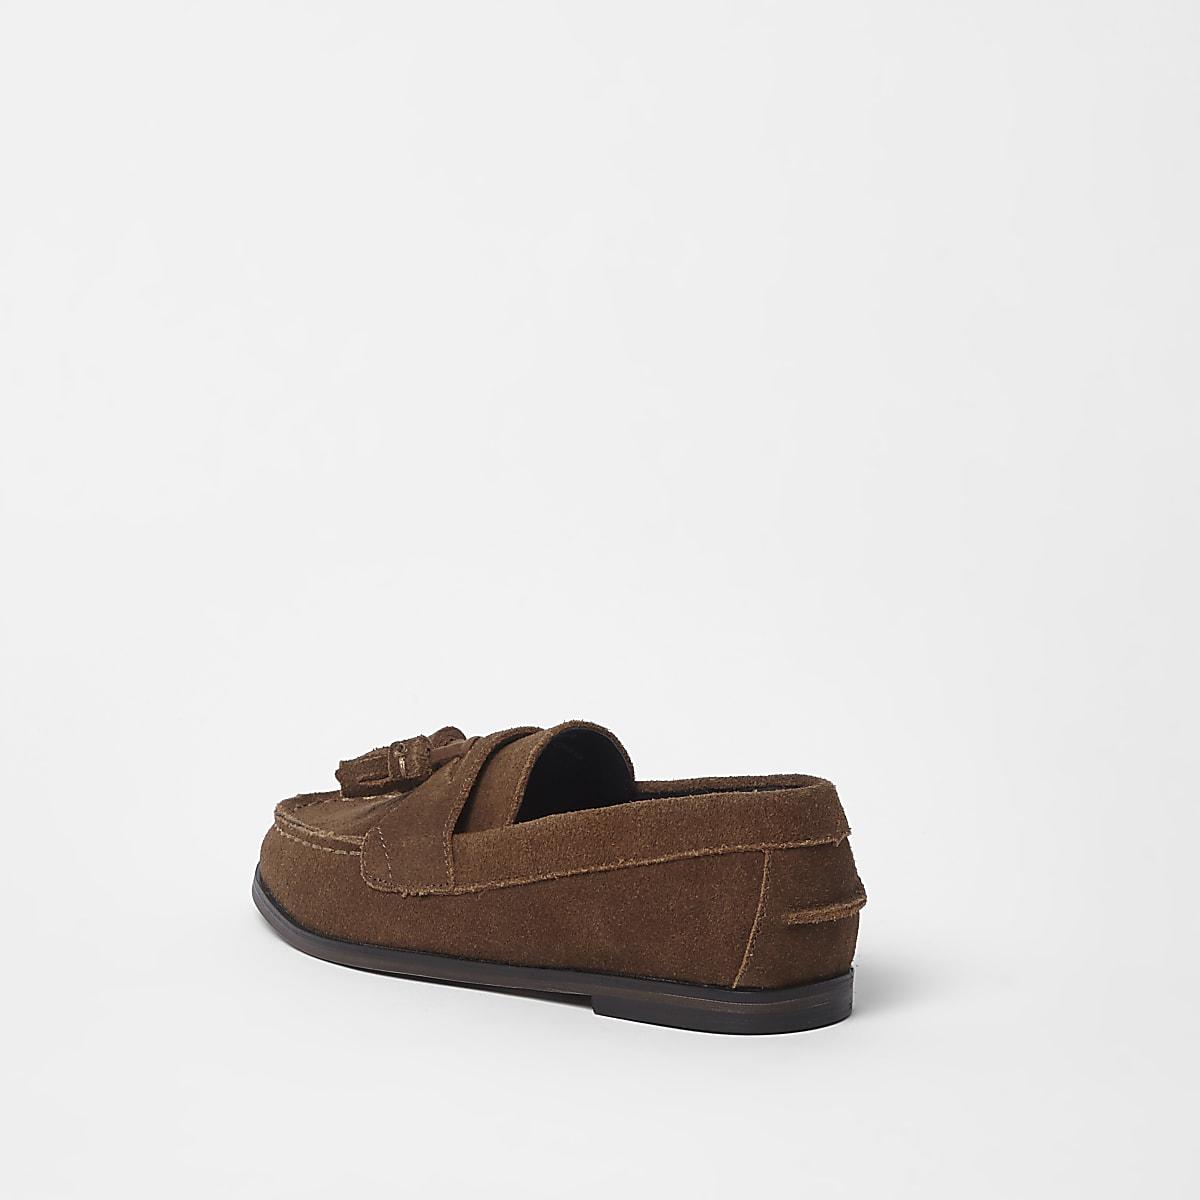 fa677a98015 Boys tan suede tassel loafers - Shoes - Footwear - boys